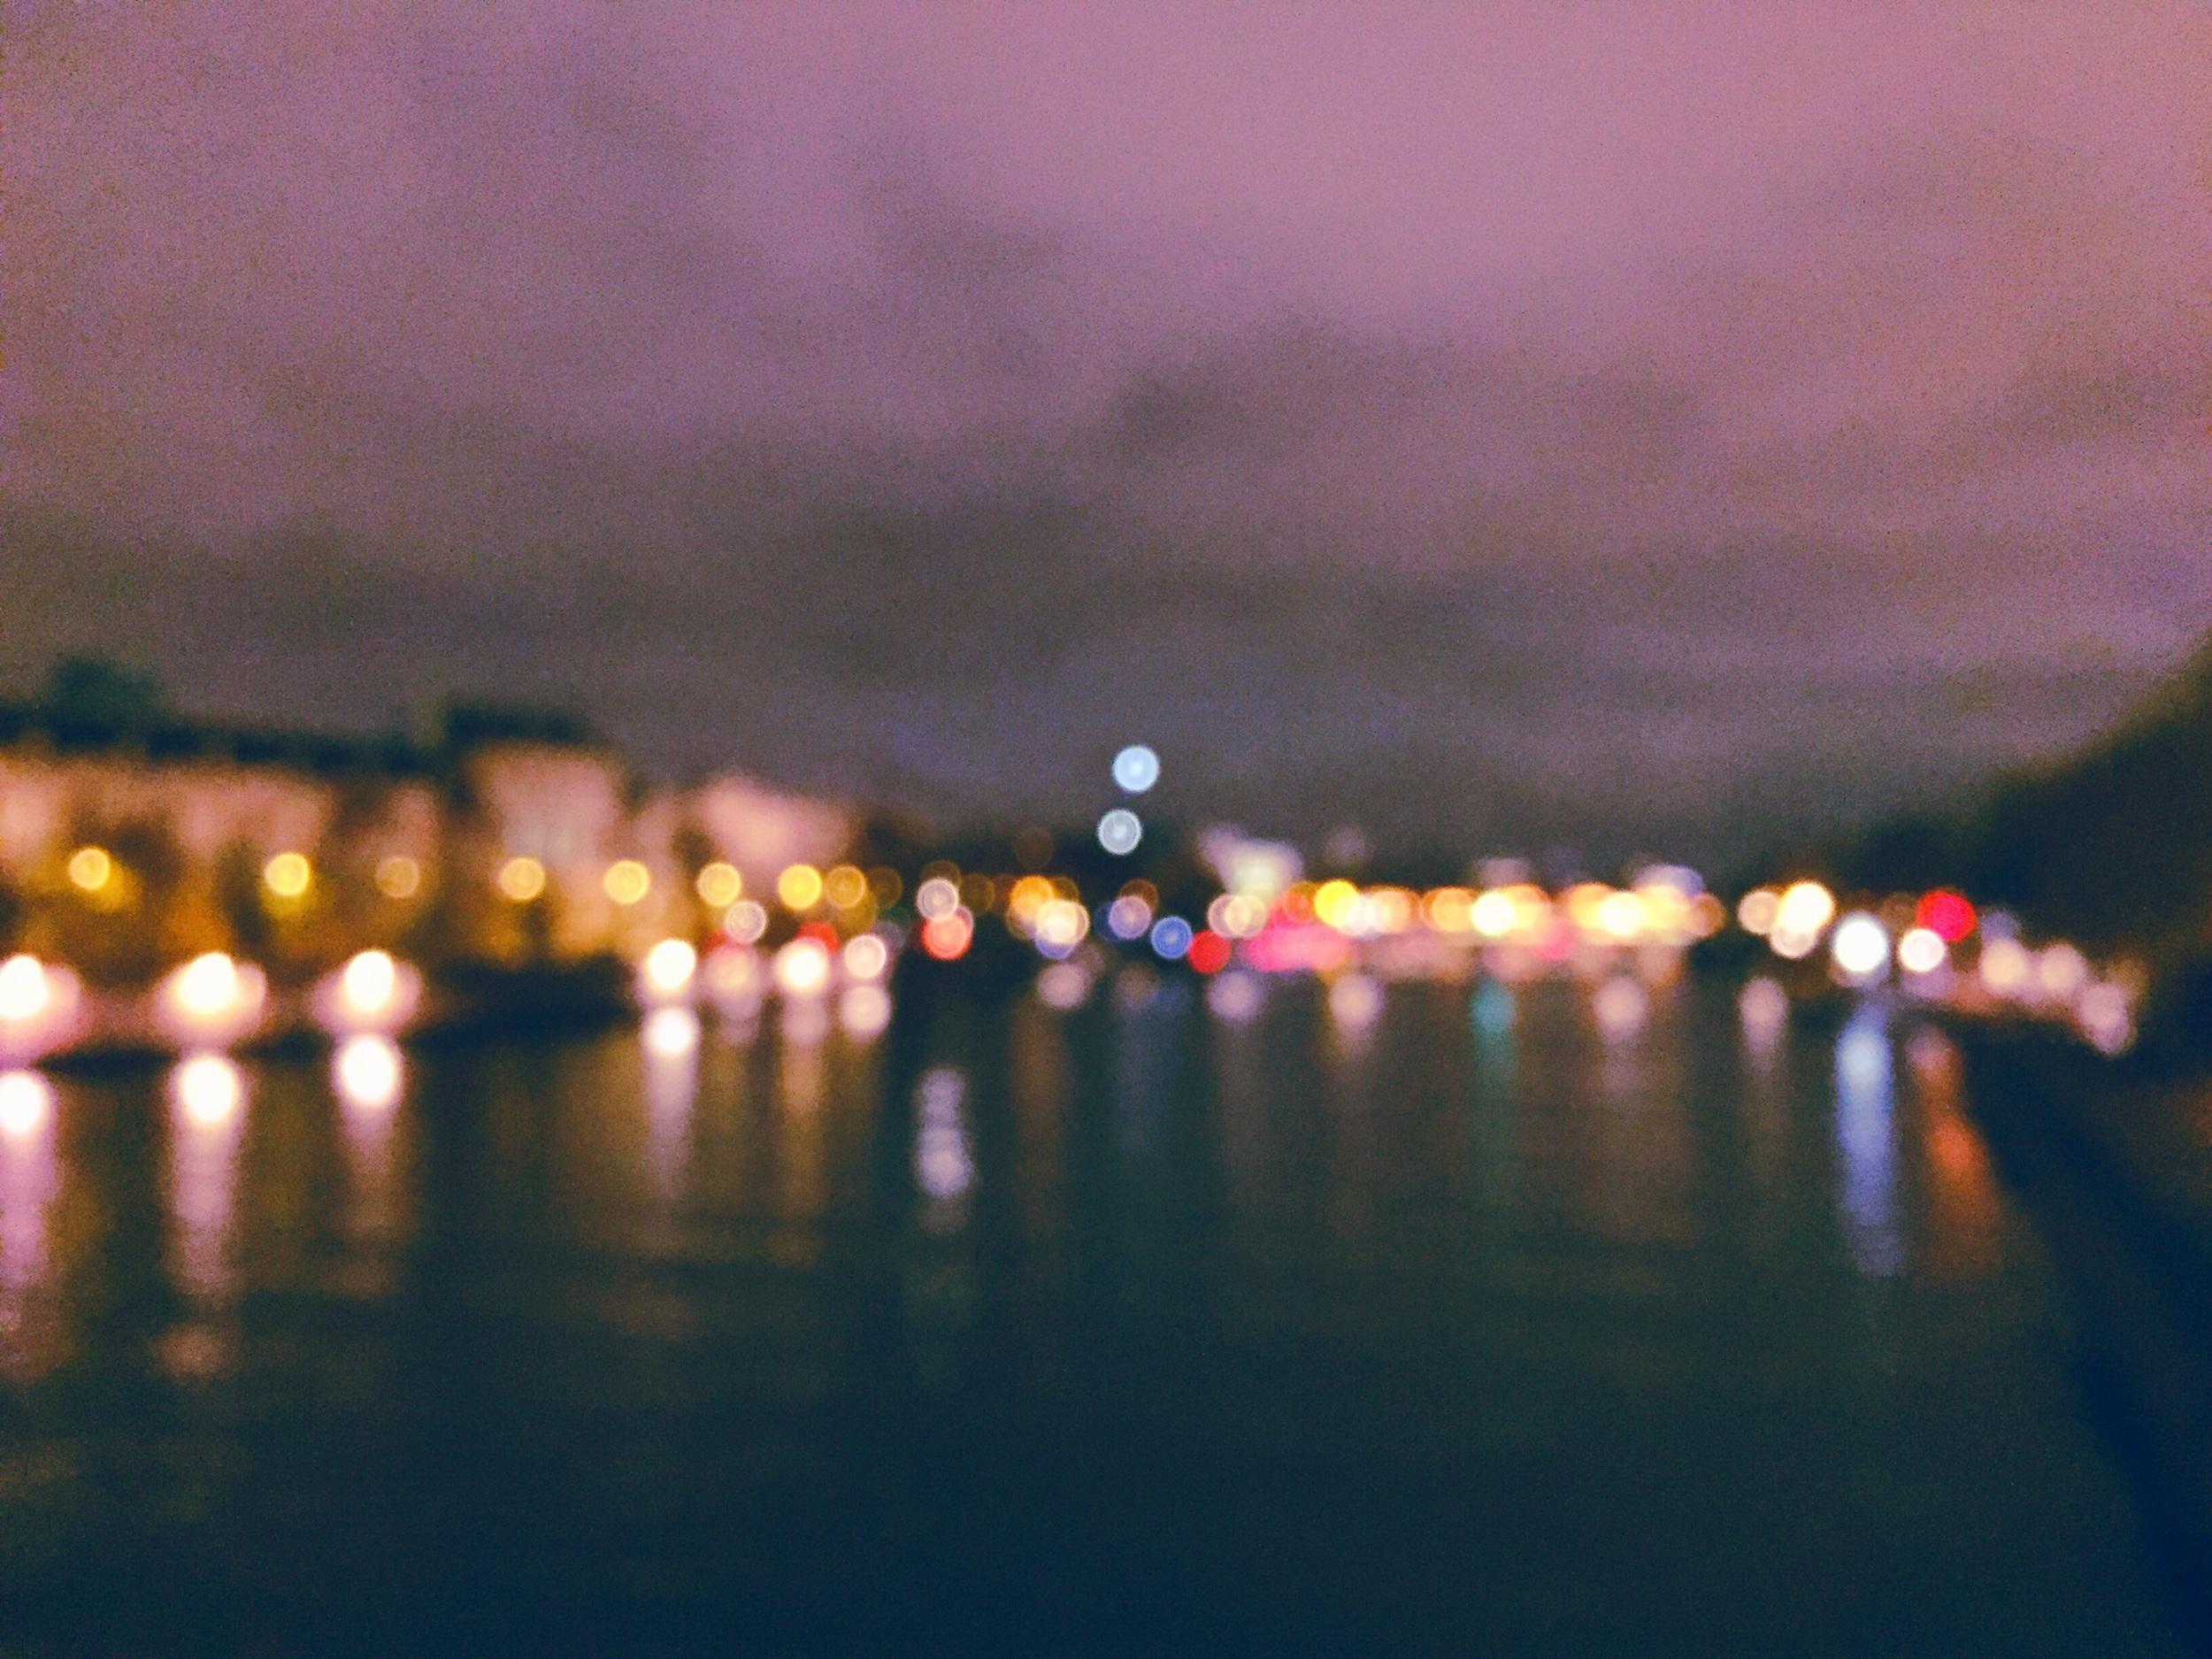 The Seine on a rainy evening.